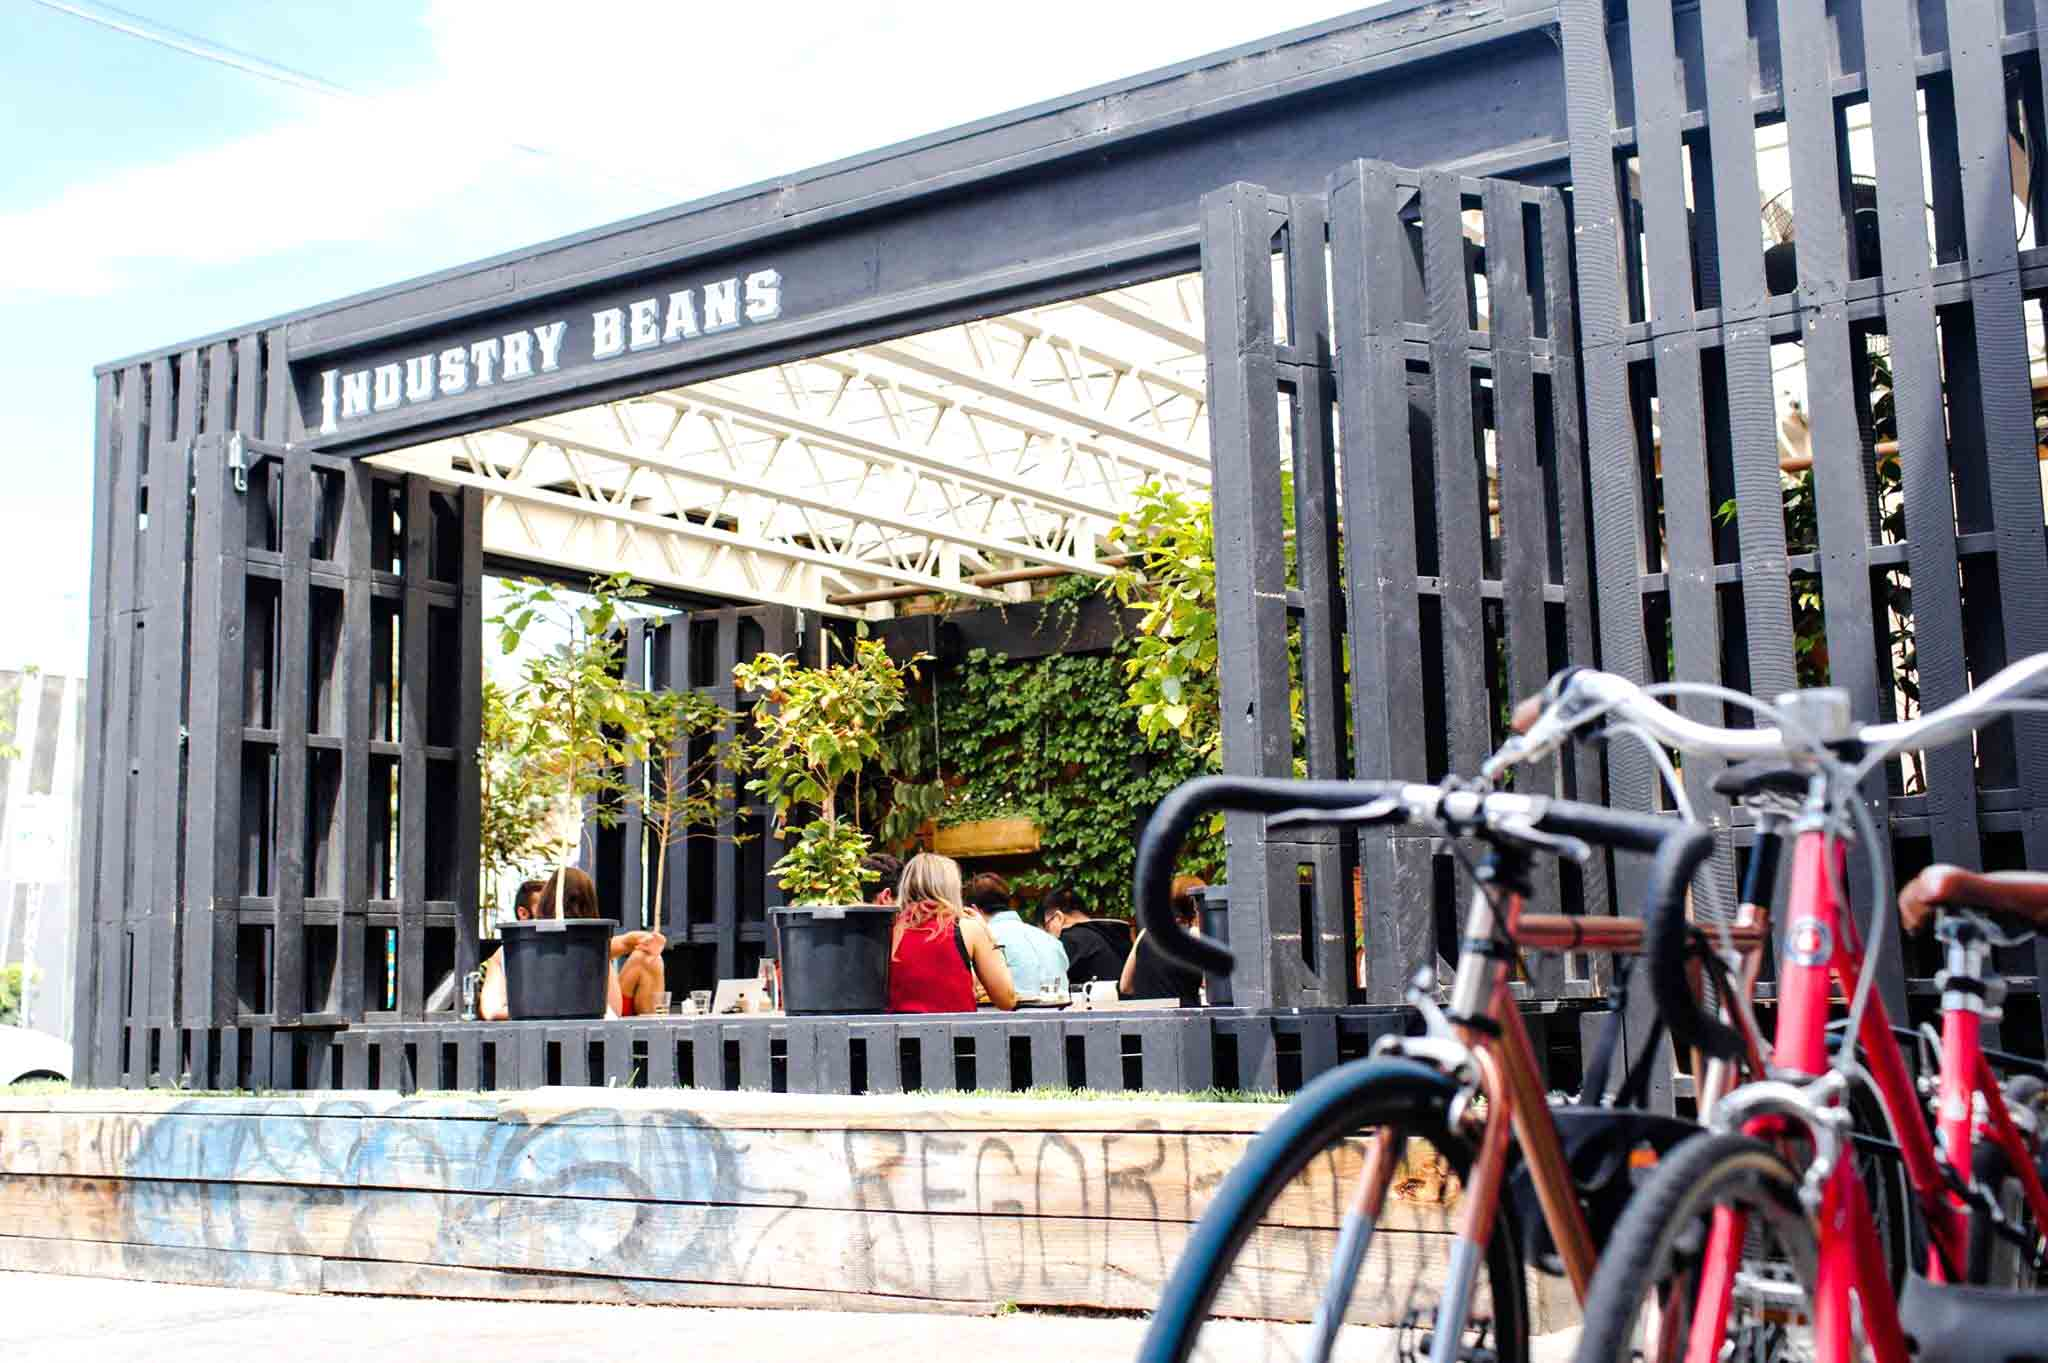 Industry Beans <br/> Best Brunch Cafes